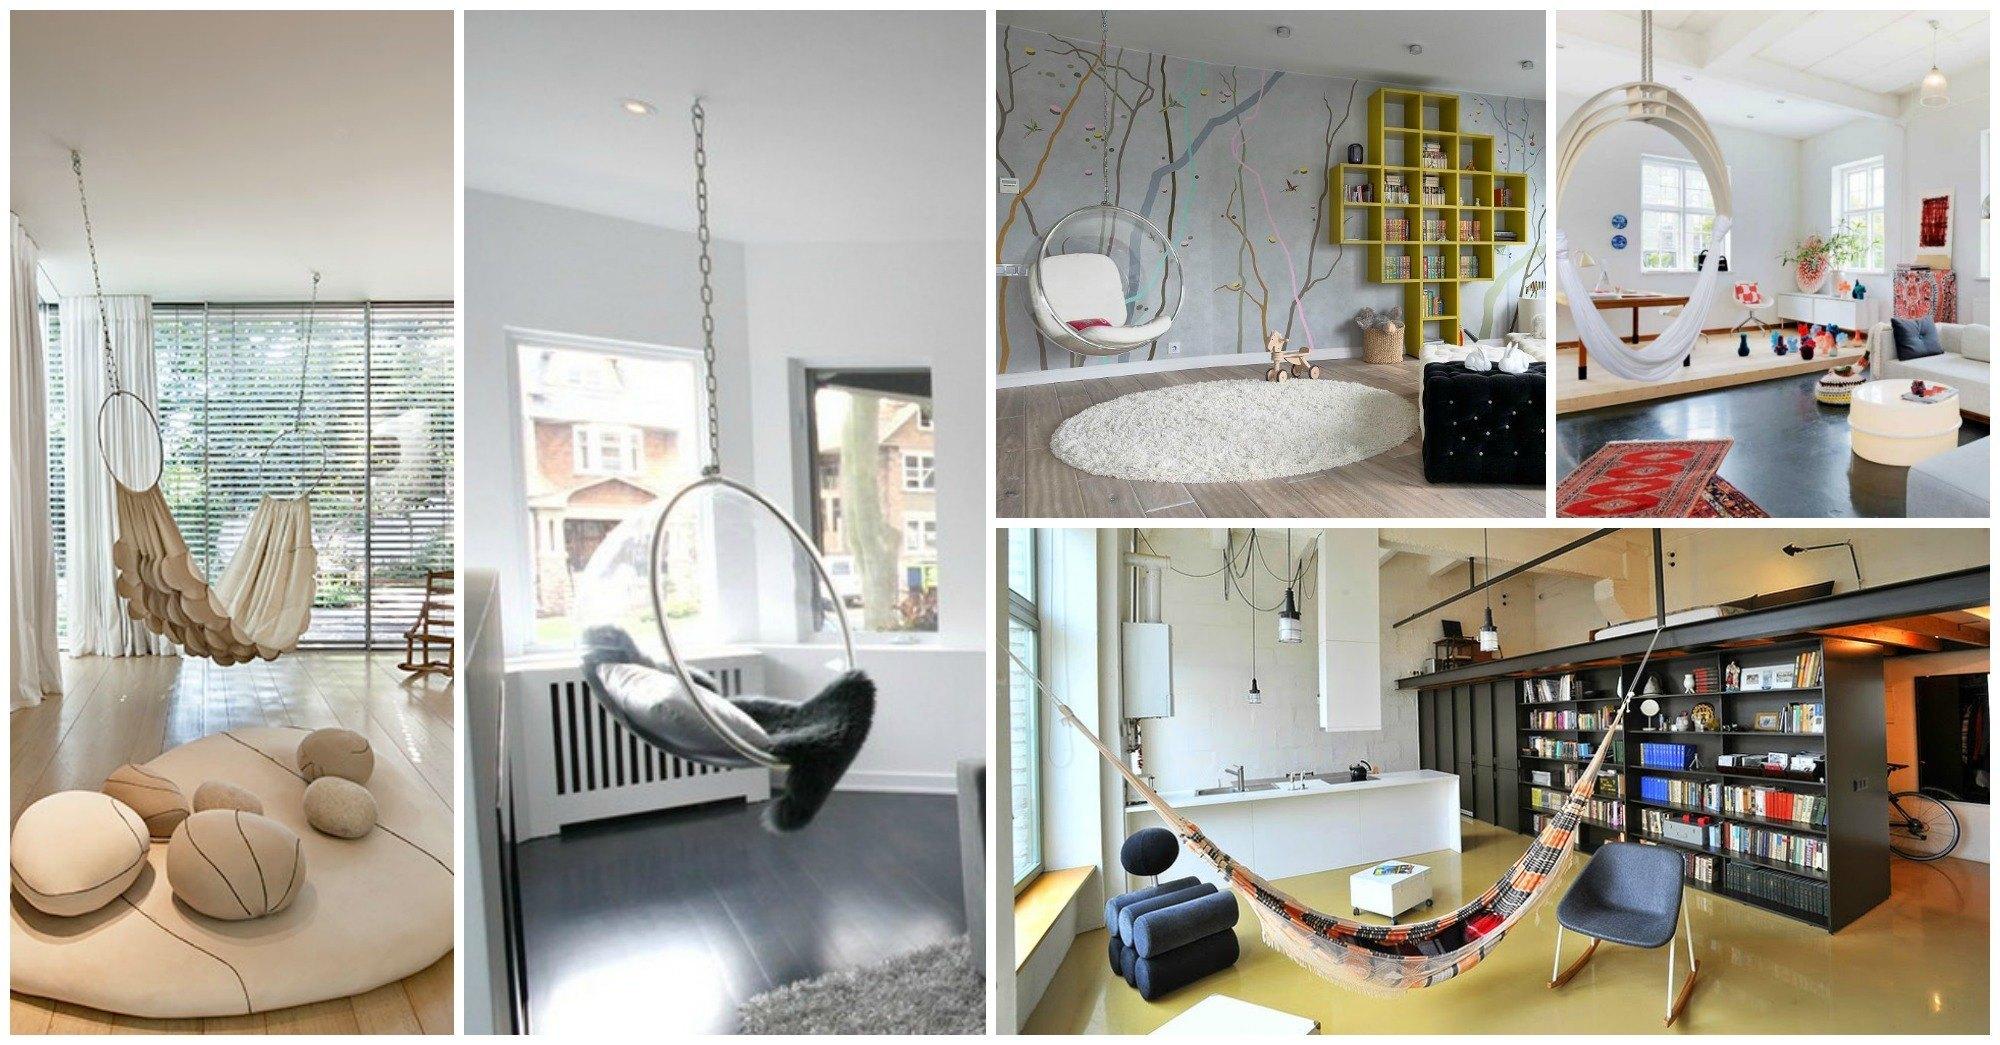 Impressive Indoor Hammock Designs For Ultimate Relaxation